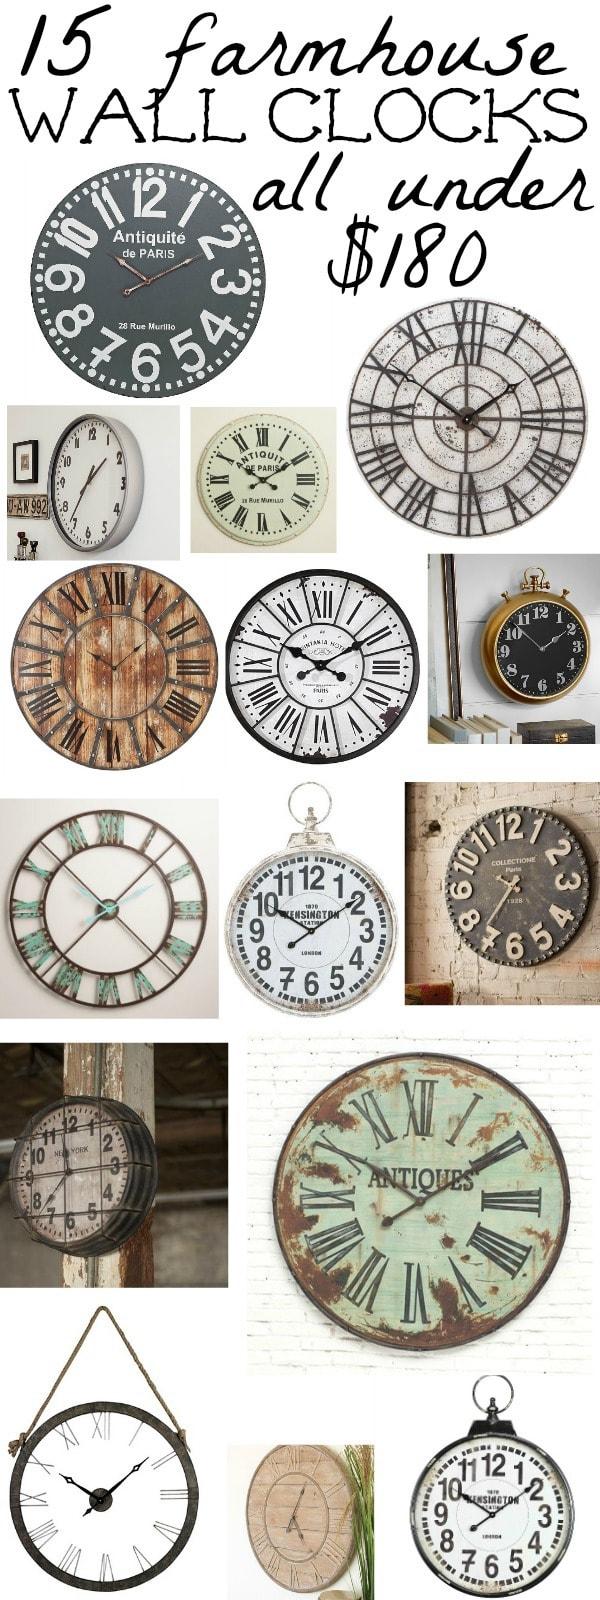 15 Farmhouse Clocks Under $180